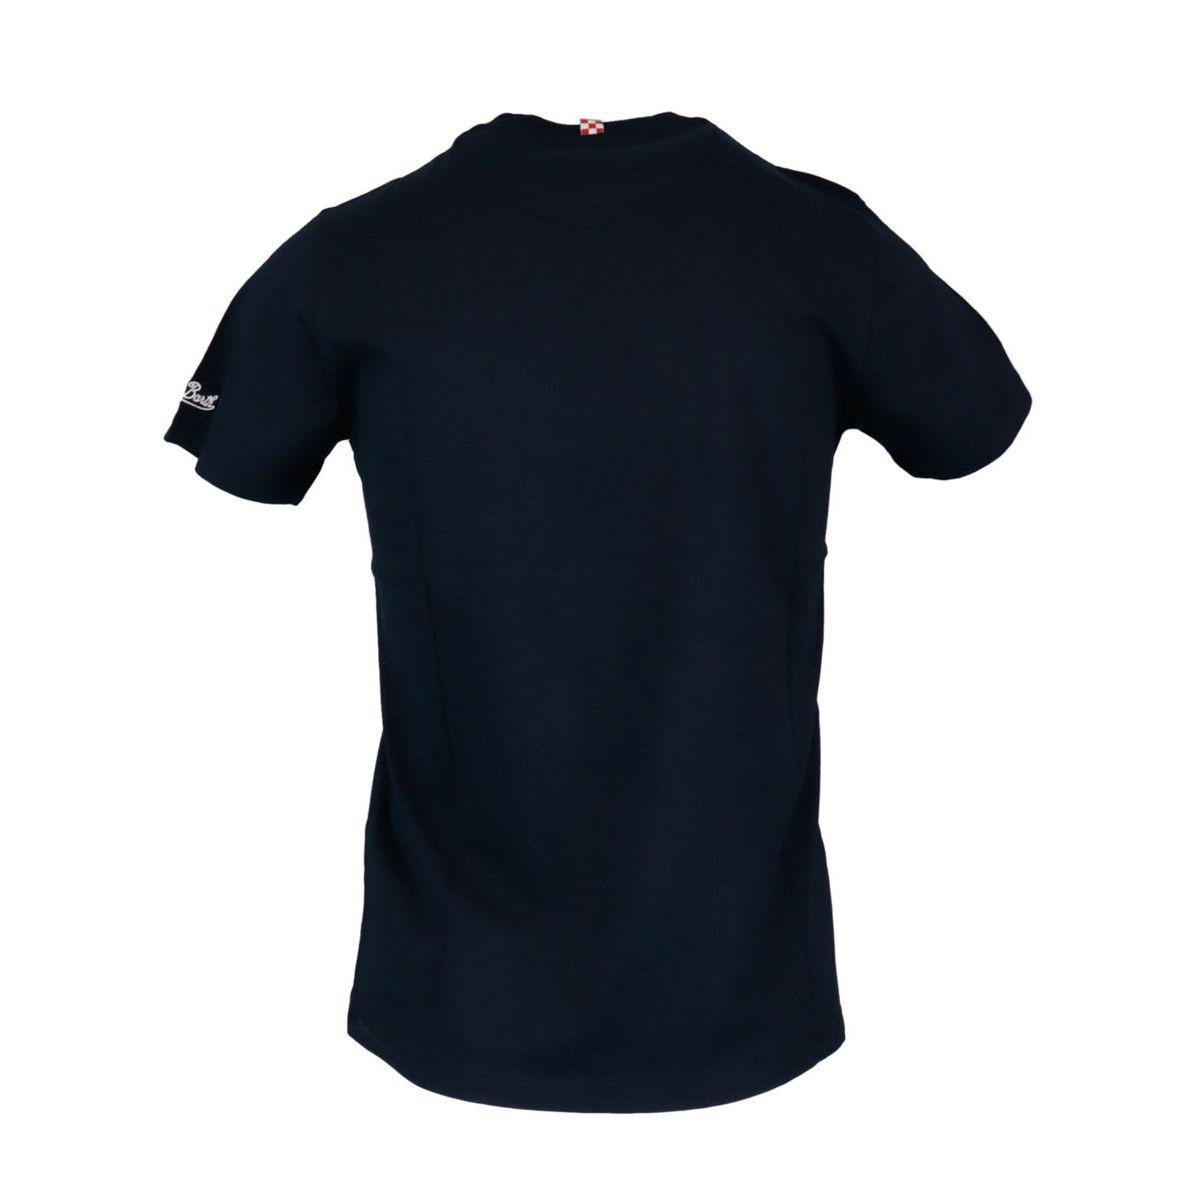 Cotton T-shirt 61 Mojito Micro 94 Navy MC2 Saint Barth